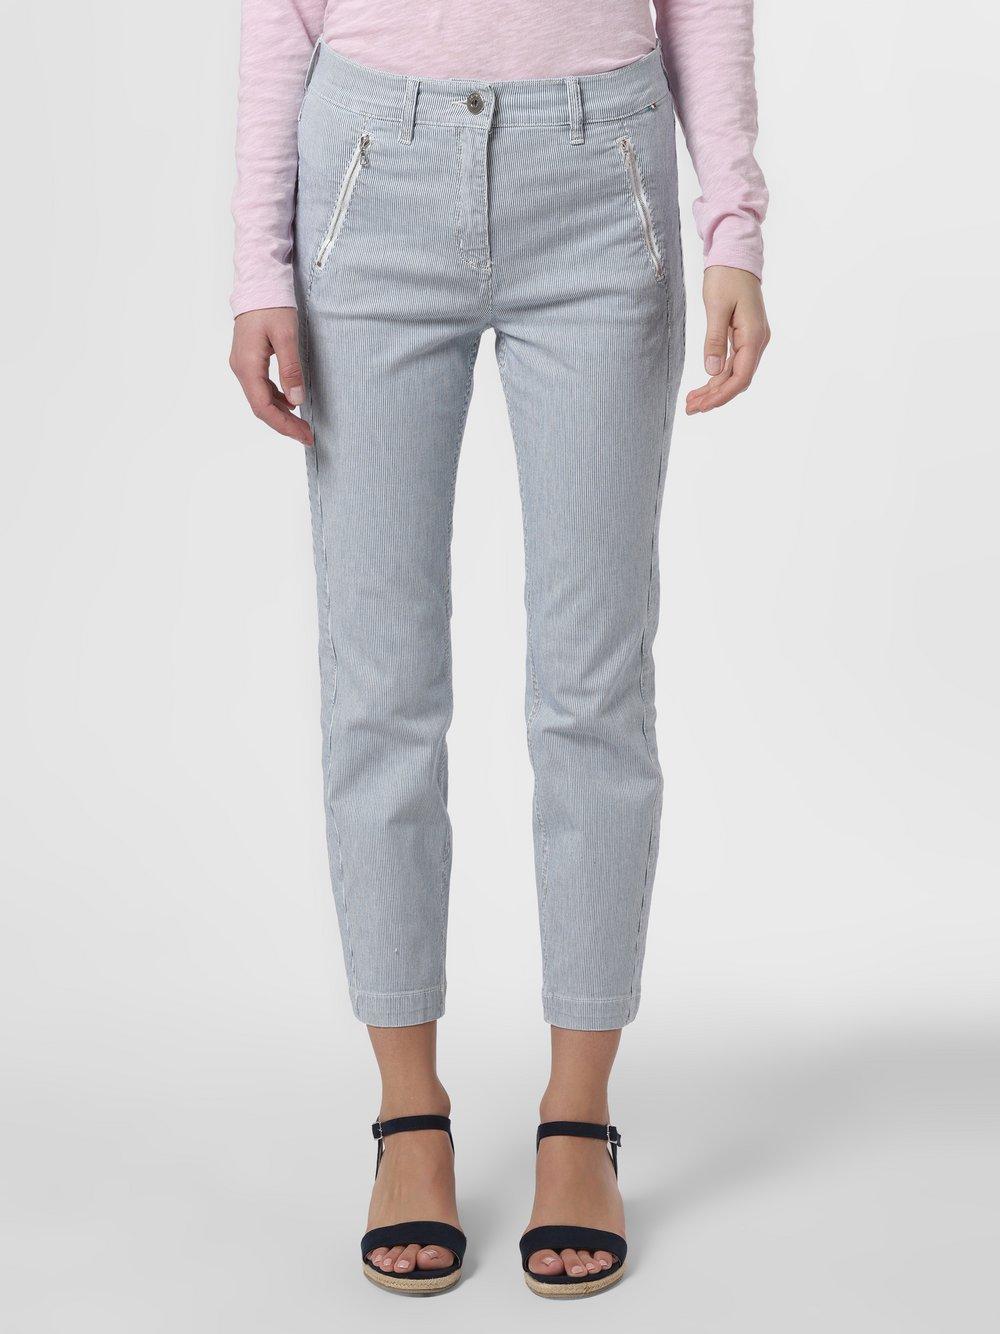 TONI – Spodnie damskie, niebieski Van Graaf 464326-0001-00460